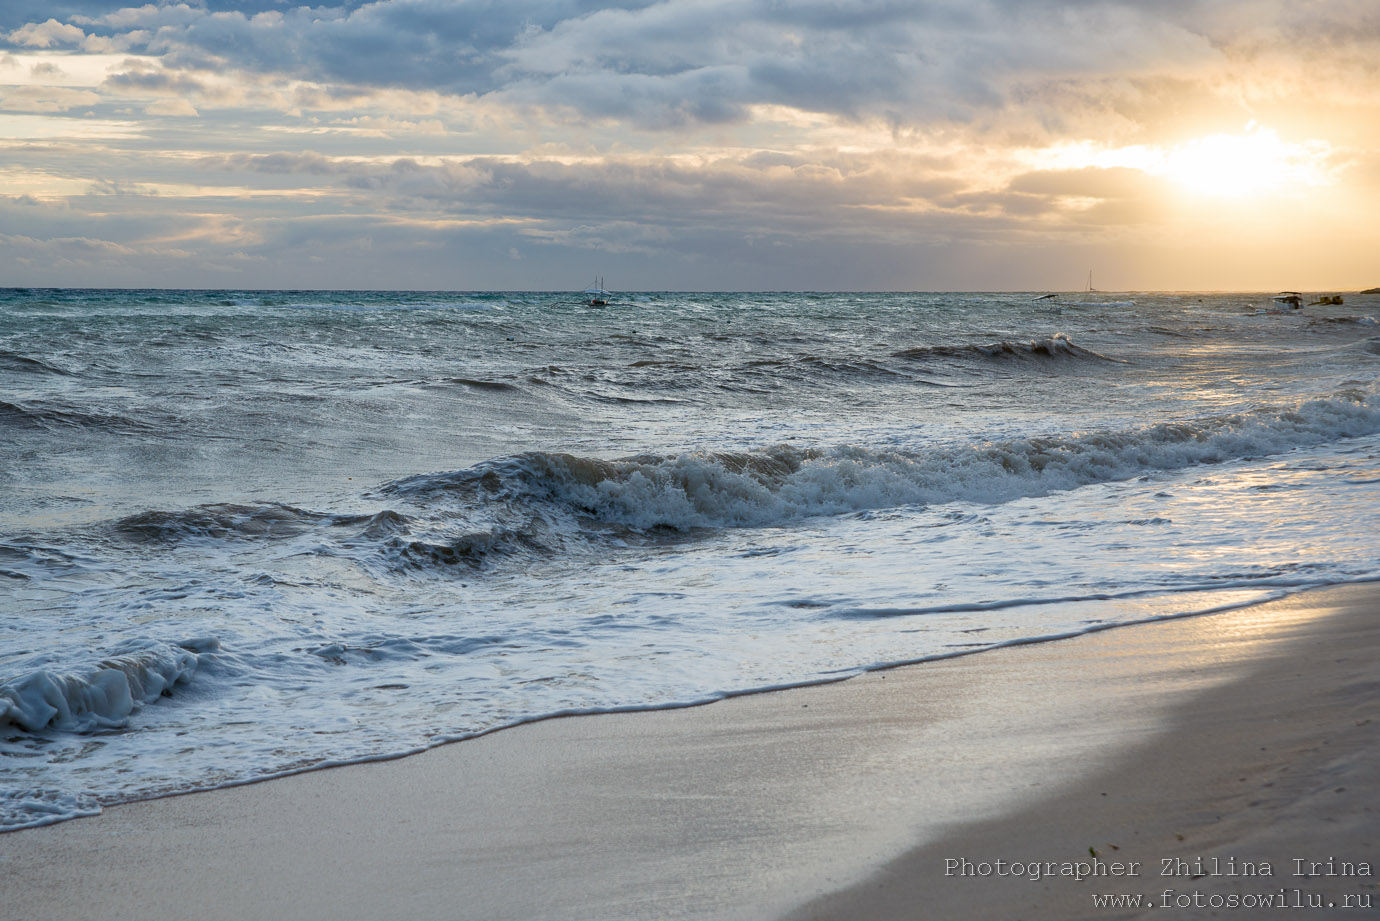 Алона Бич, Панглао, тайфун, Alona beach